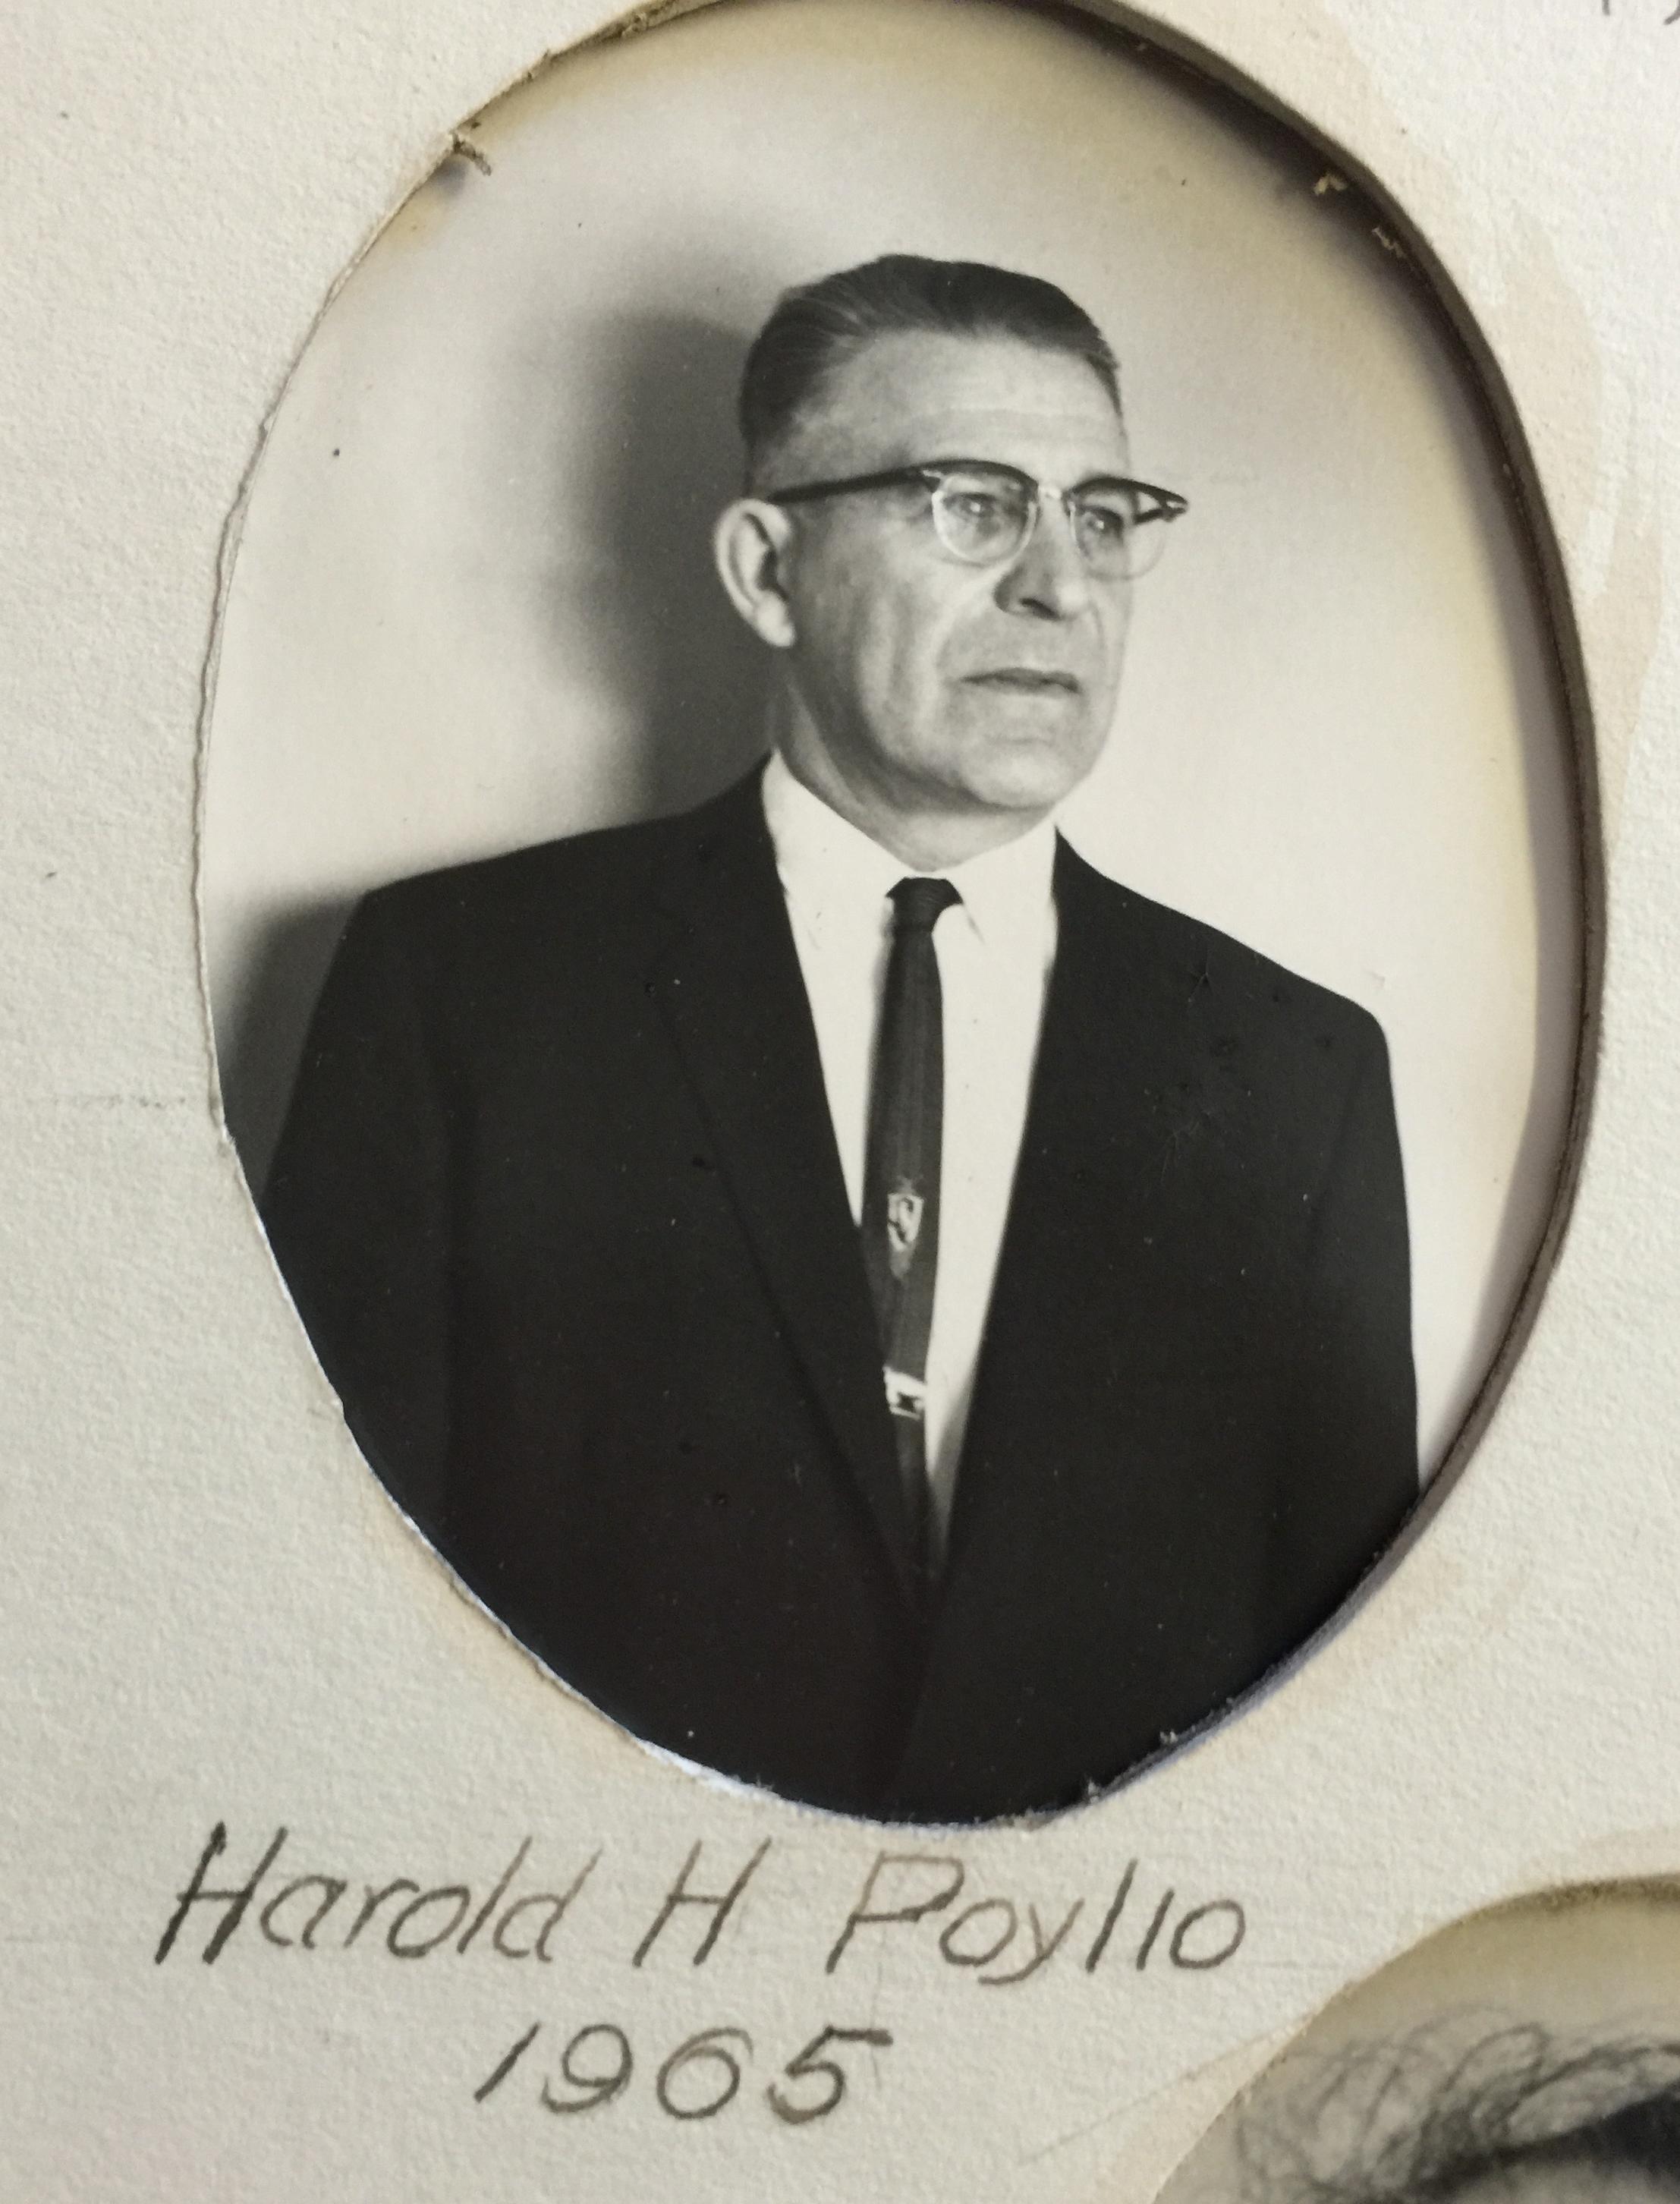 1965 Harold H. Poyllo